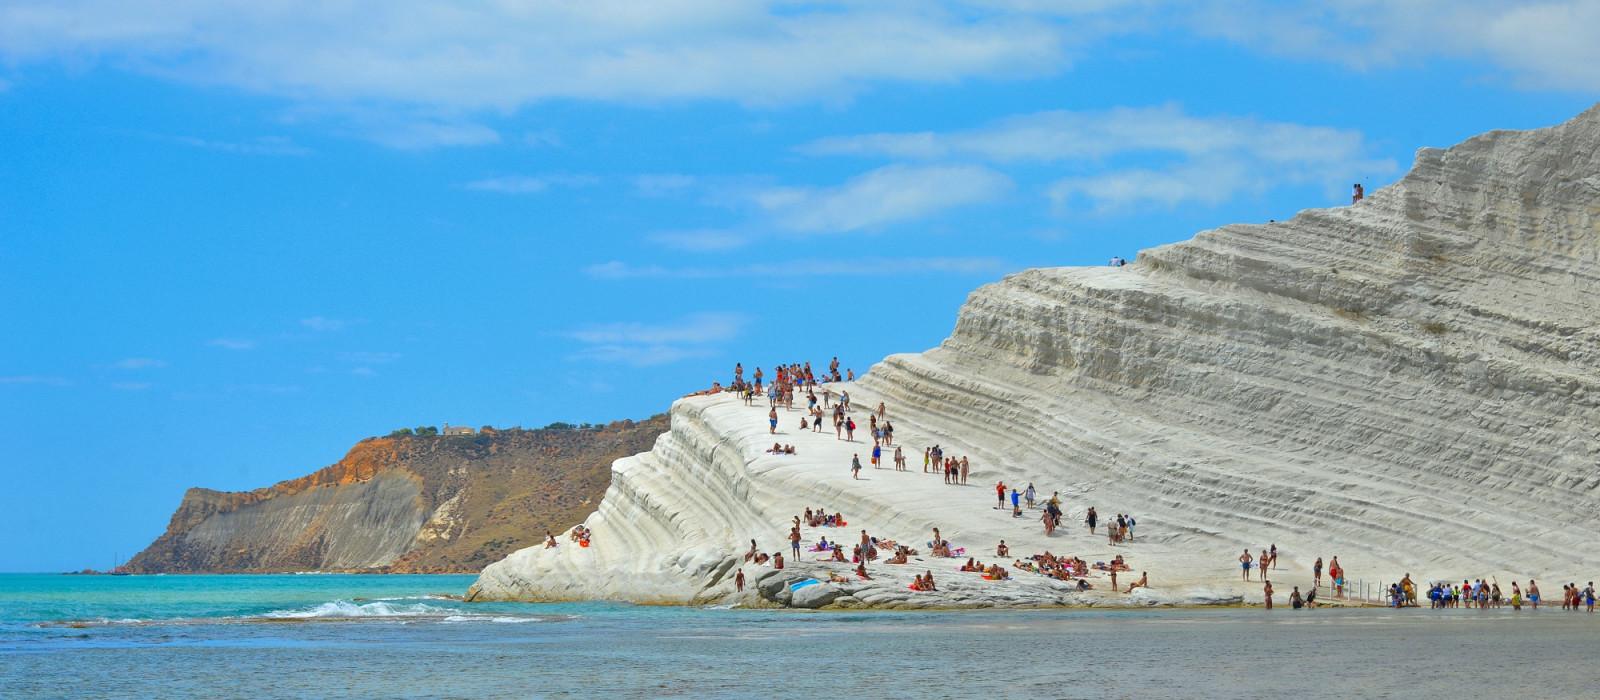 Reiseziel Agrigento Italien